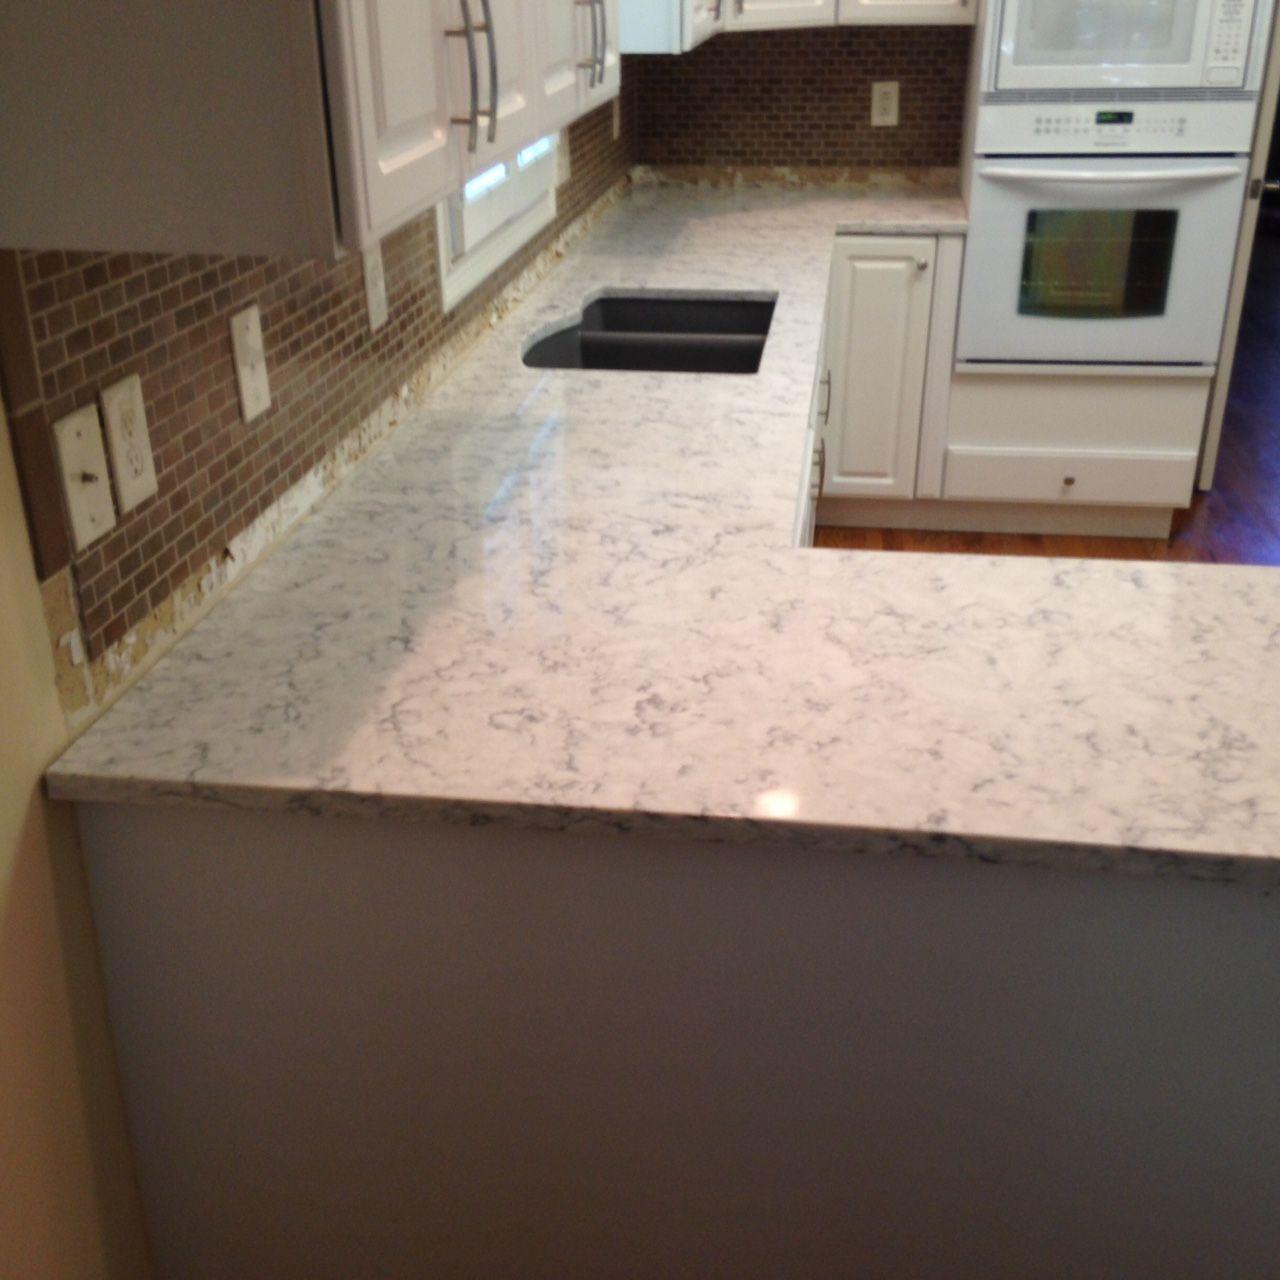 Superb Rococo LG Viatera Quartz Kitchen Countertop Install For The Purdy Family.  Knoxvilleu0027s Stone Interiors.